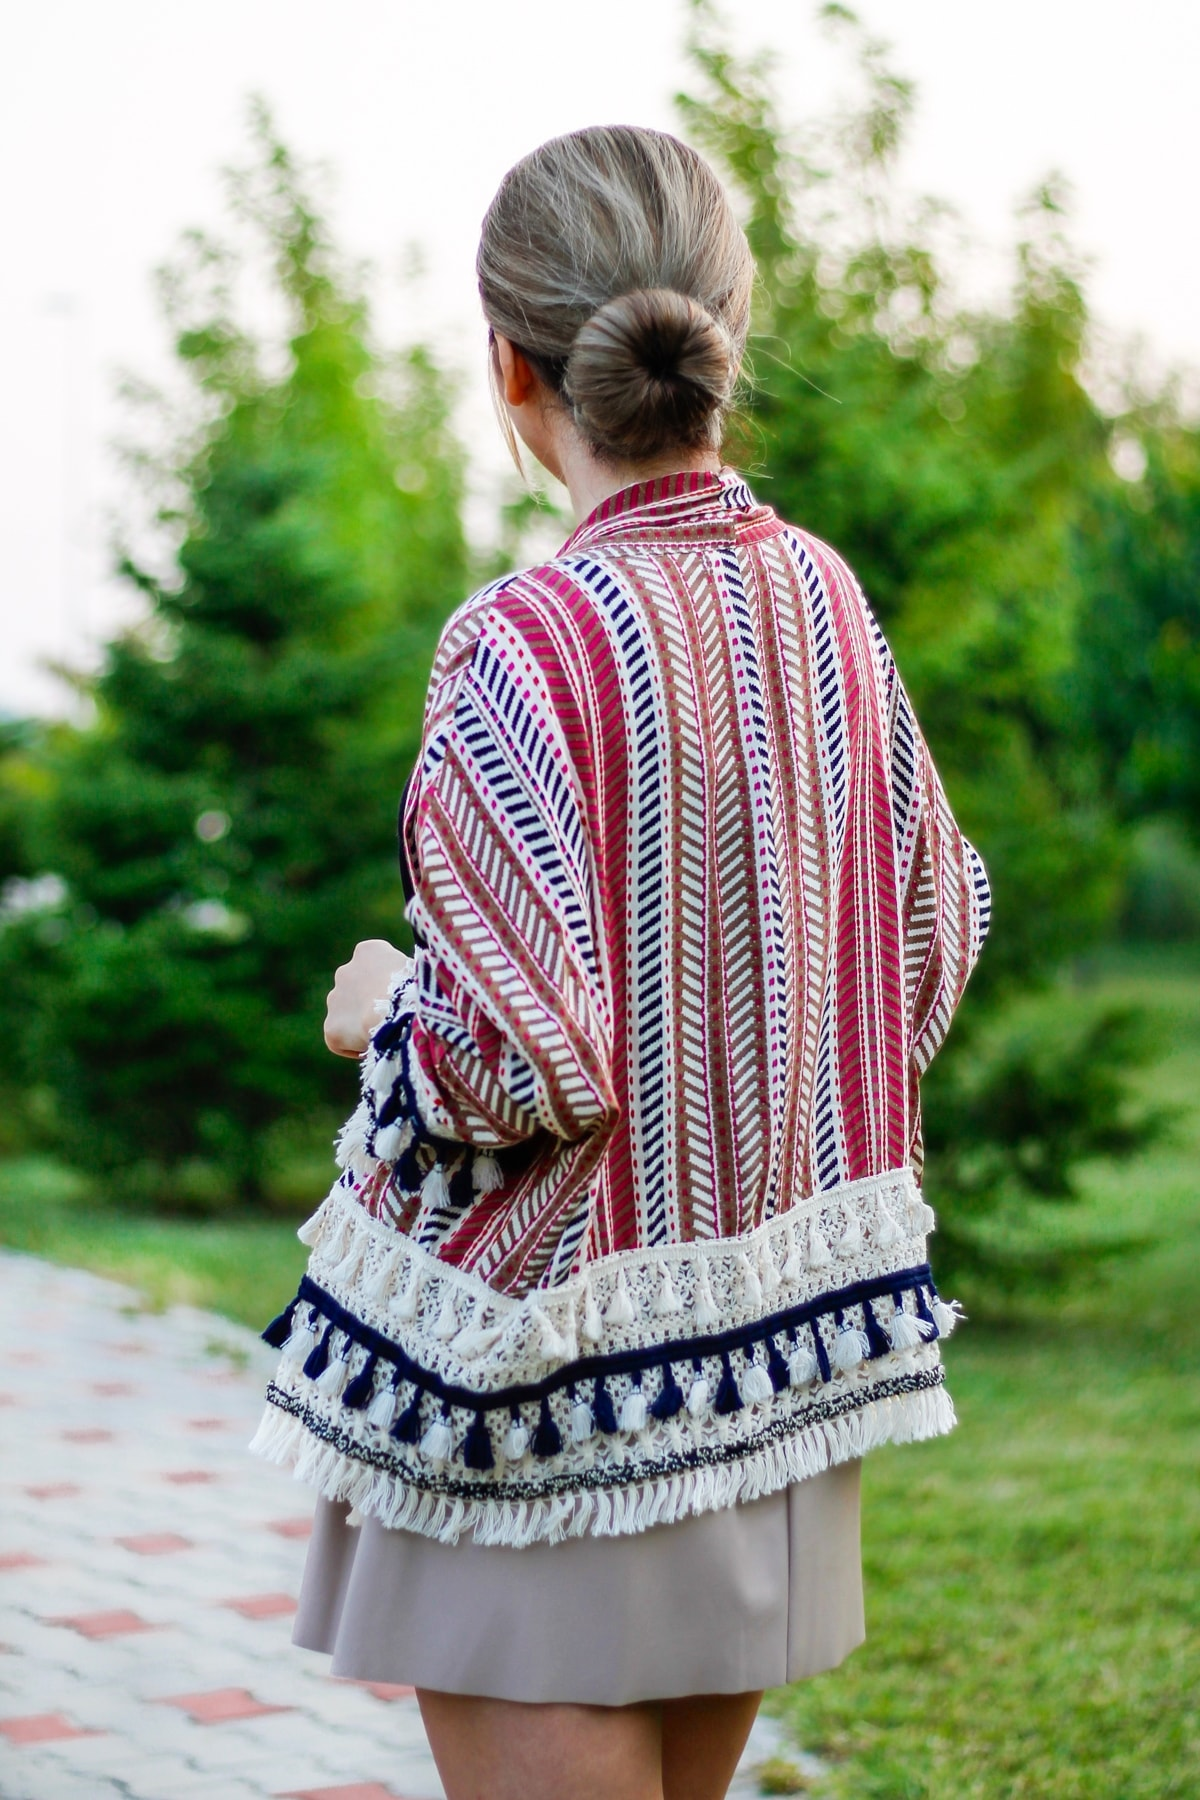 kimono tassels, stripes, romwe, fashion blogger andreea ristea, street style